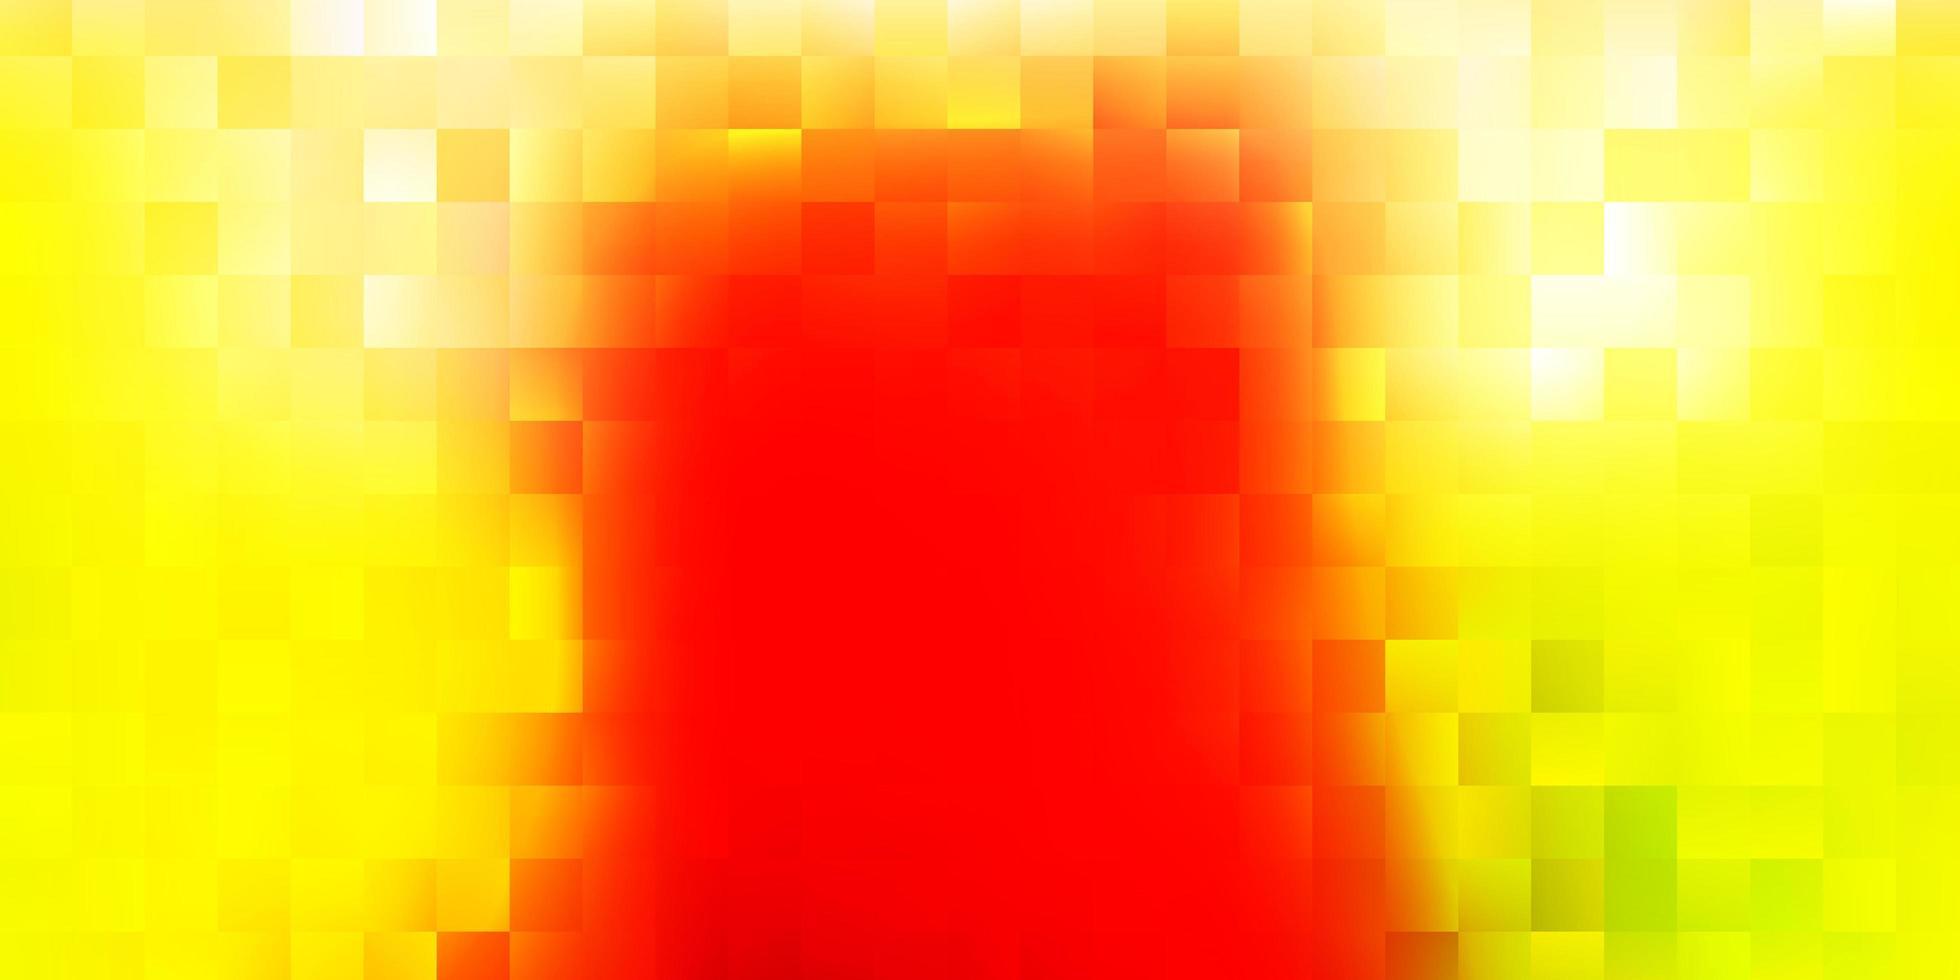 fundo escuro do vetor multicolor com retângulos.